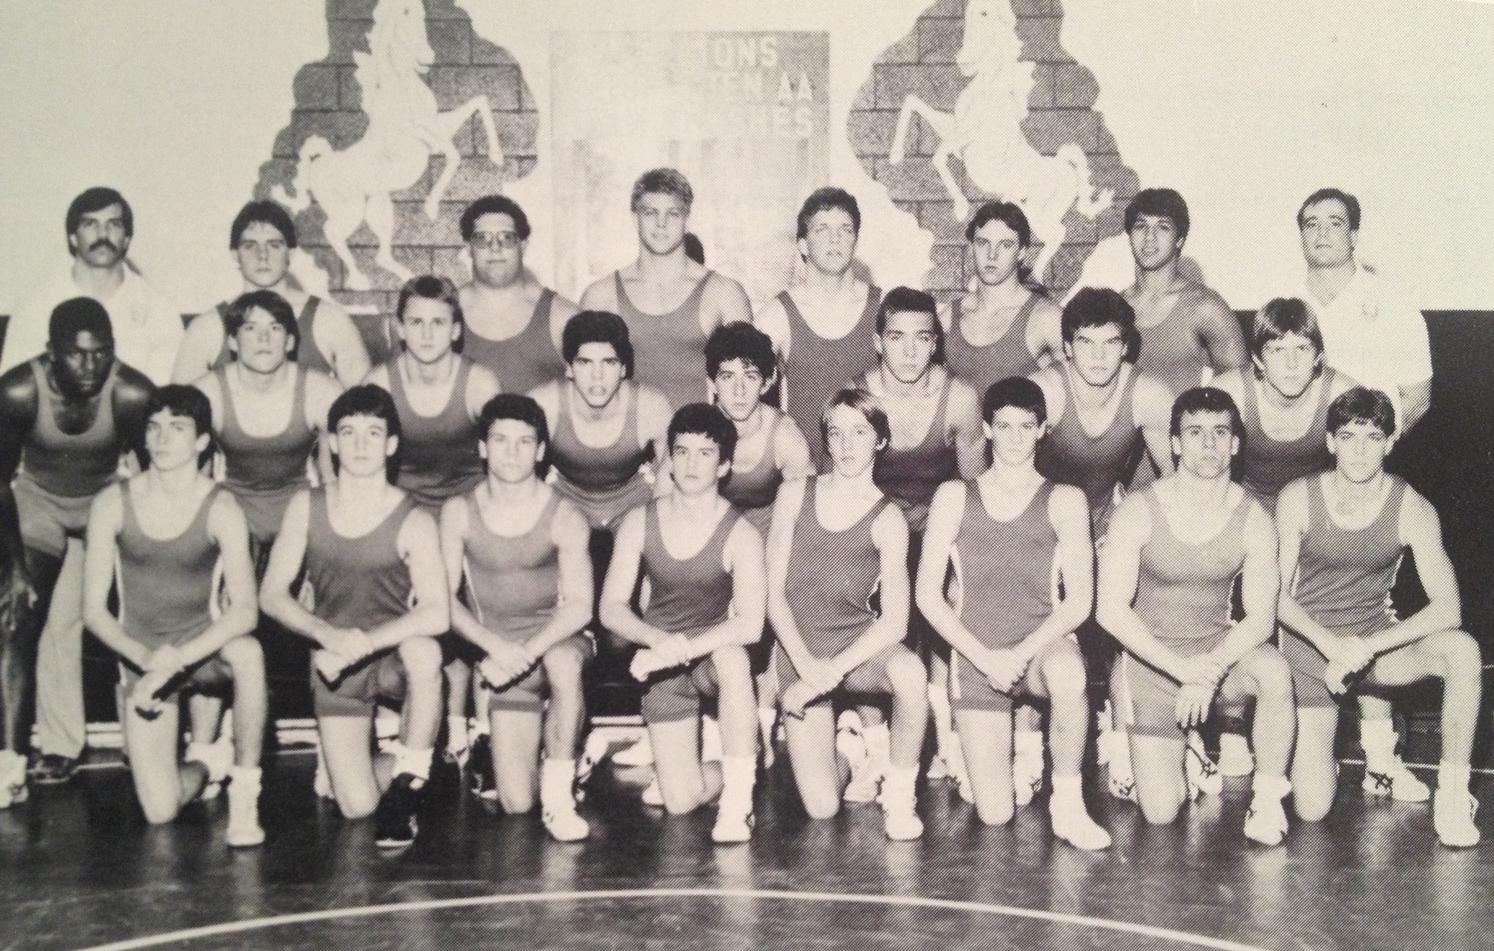 1987 District Champions